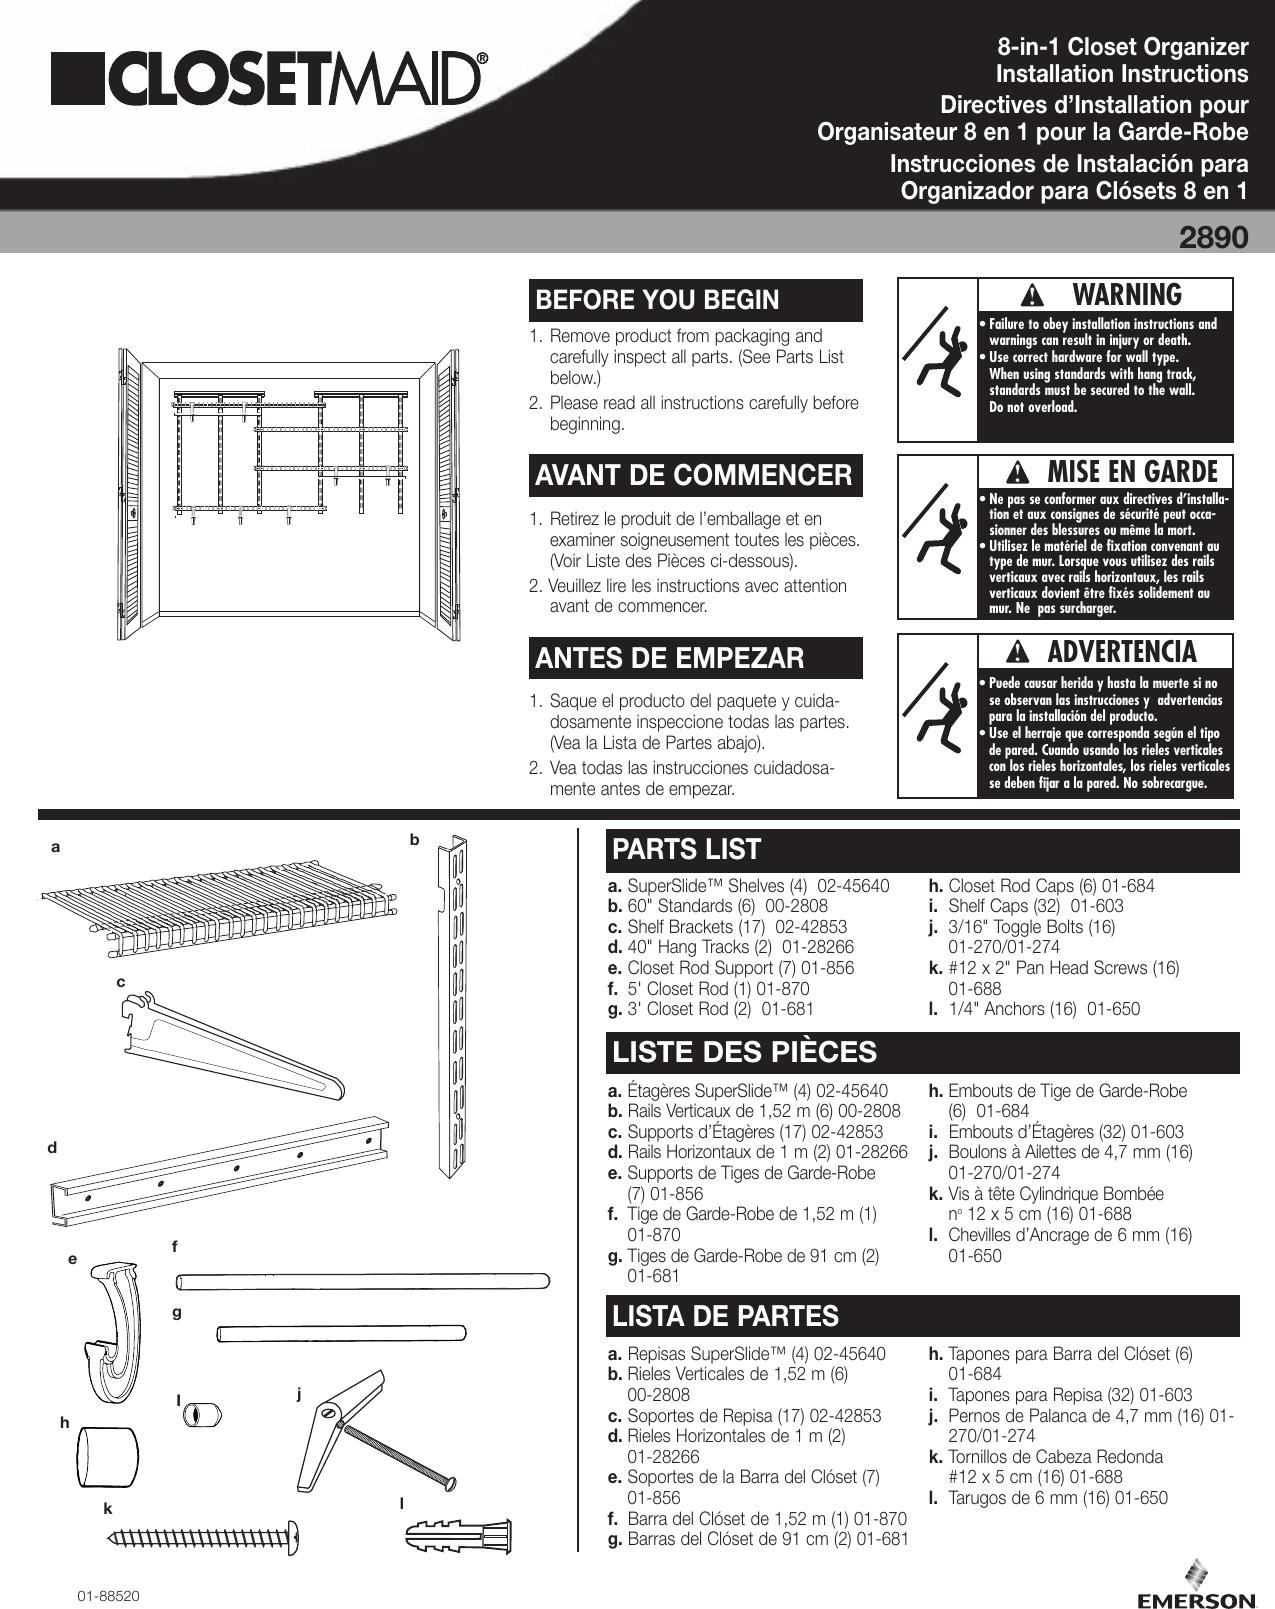 Closet Maid 8 In 1 Organizer 2890 Users Manual 5566 Inst Sht Qxp